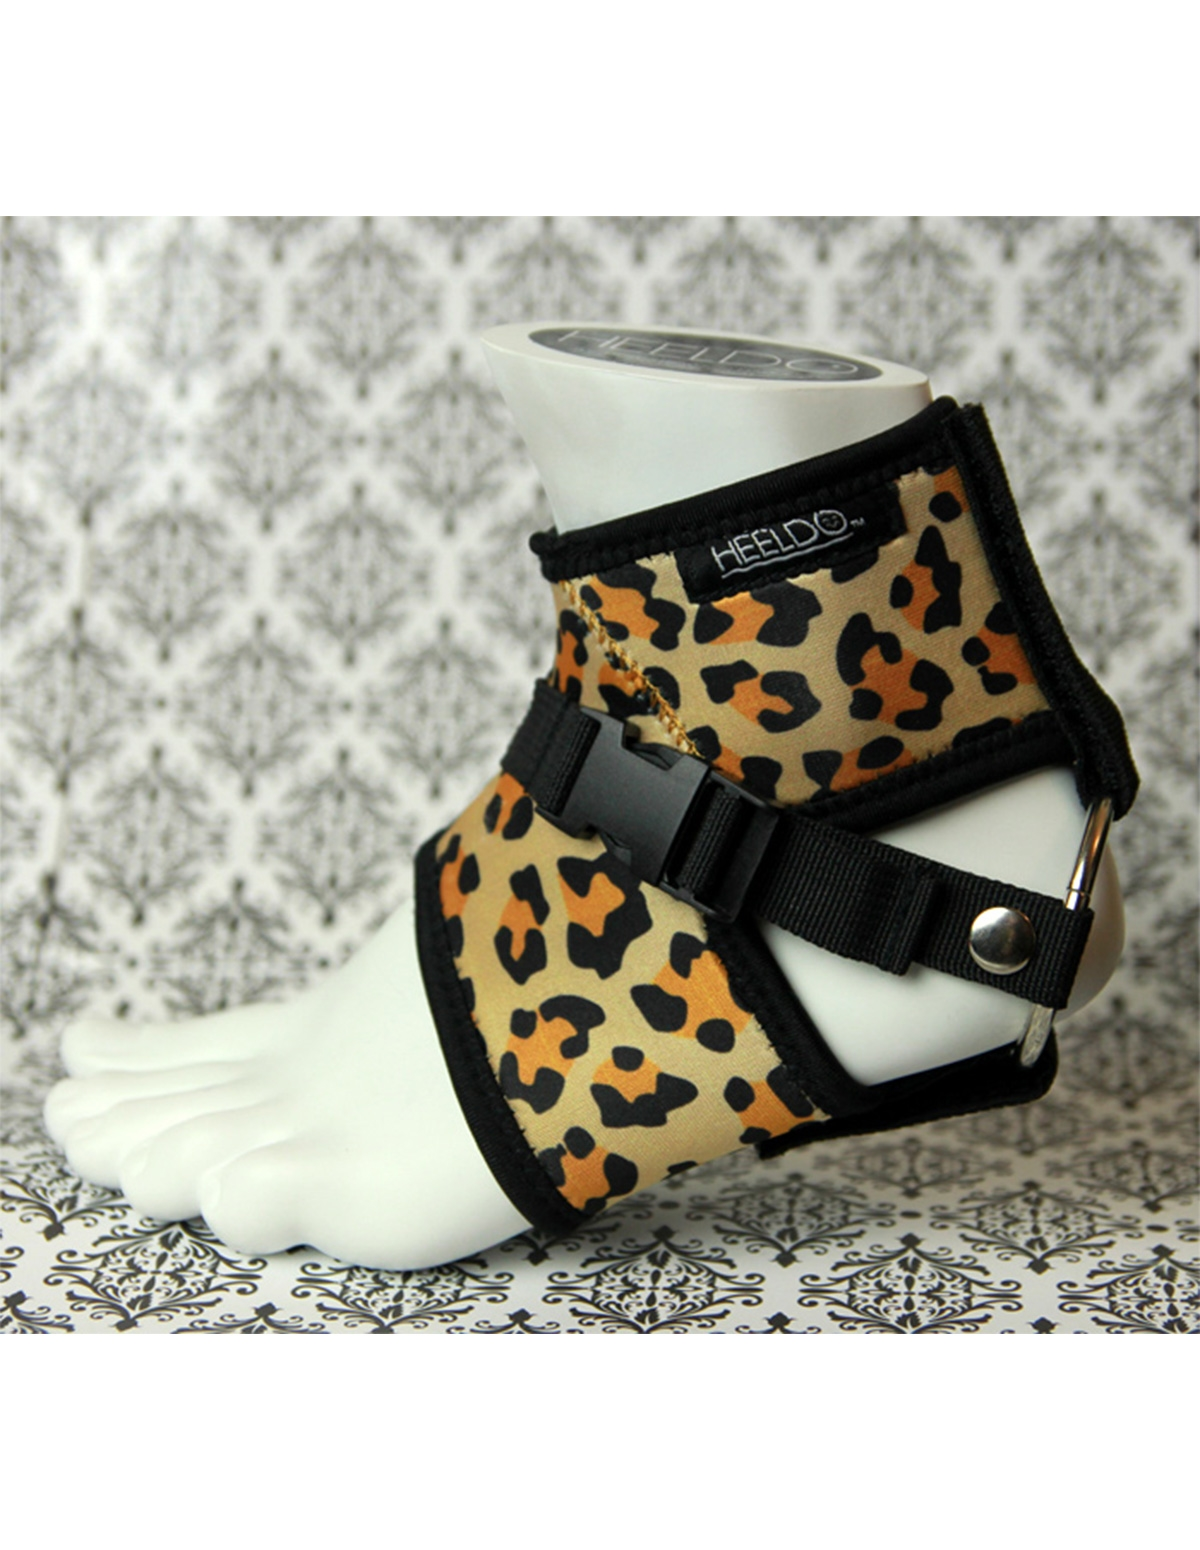 Heeldo Strap-On Foot Harness S/M